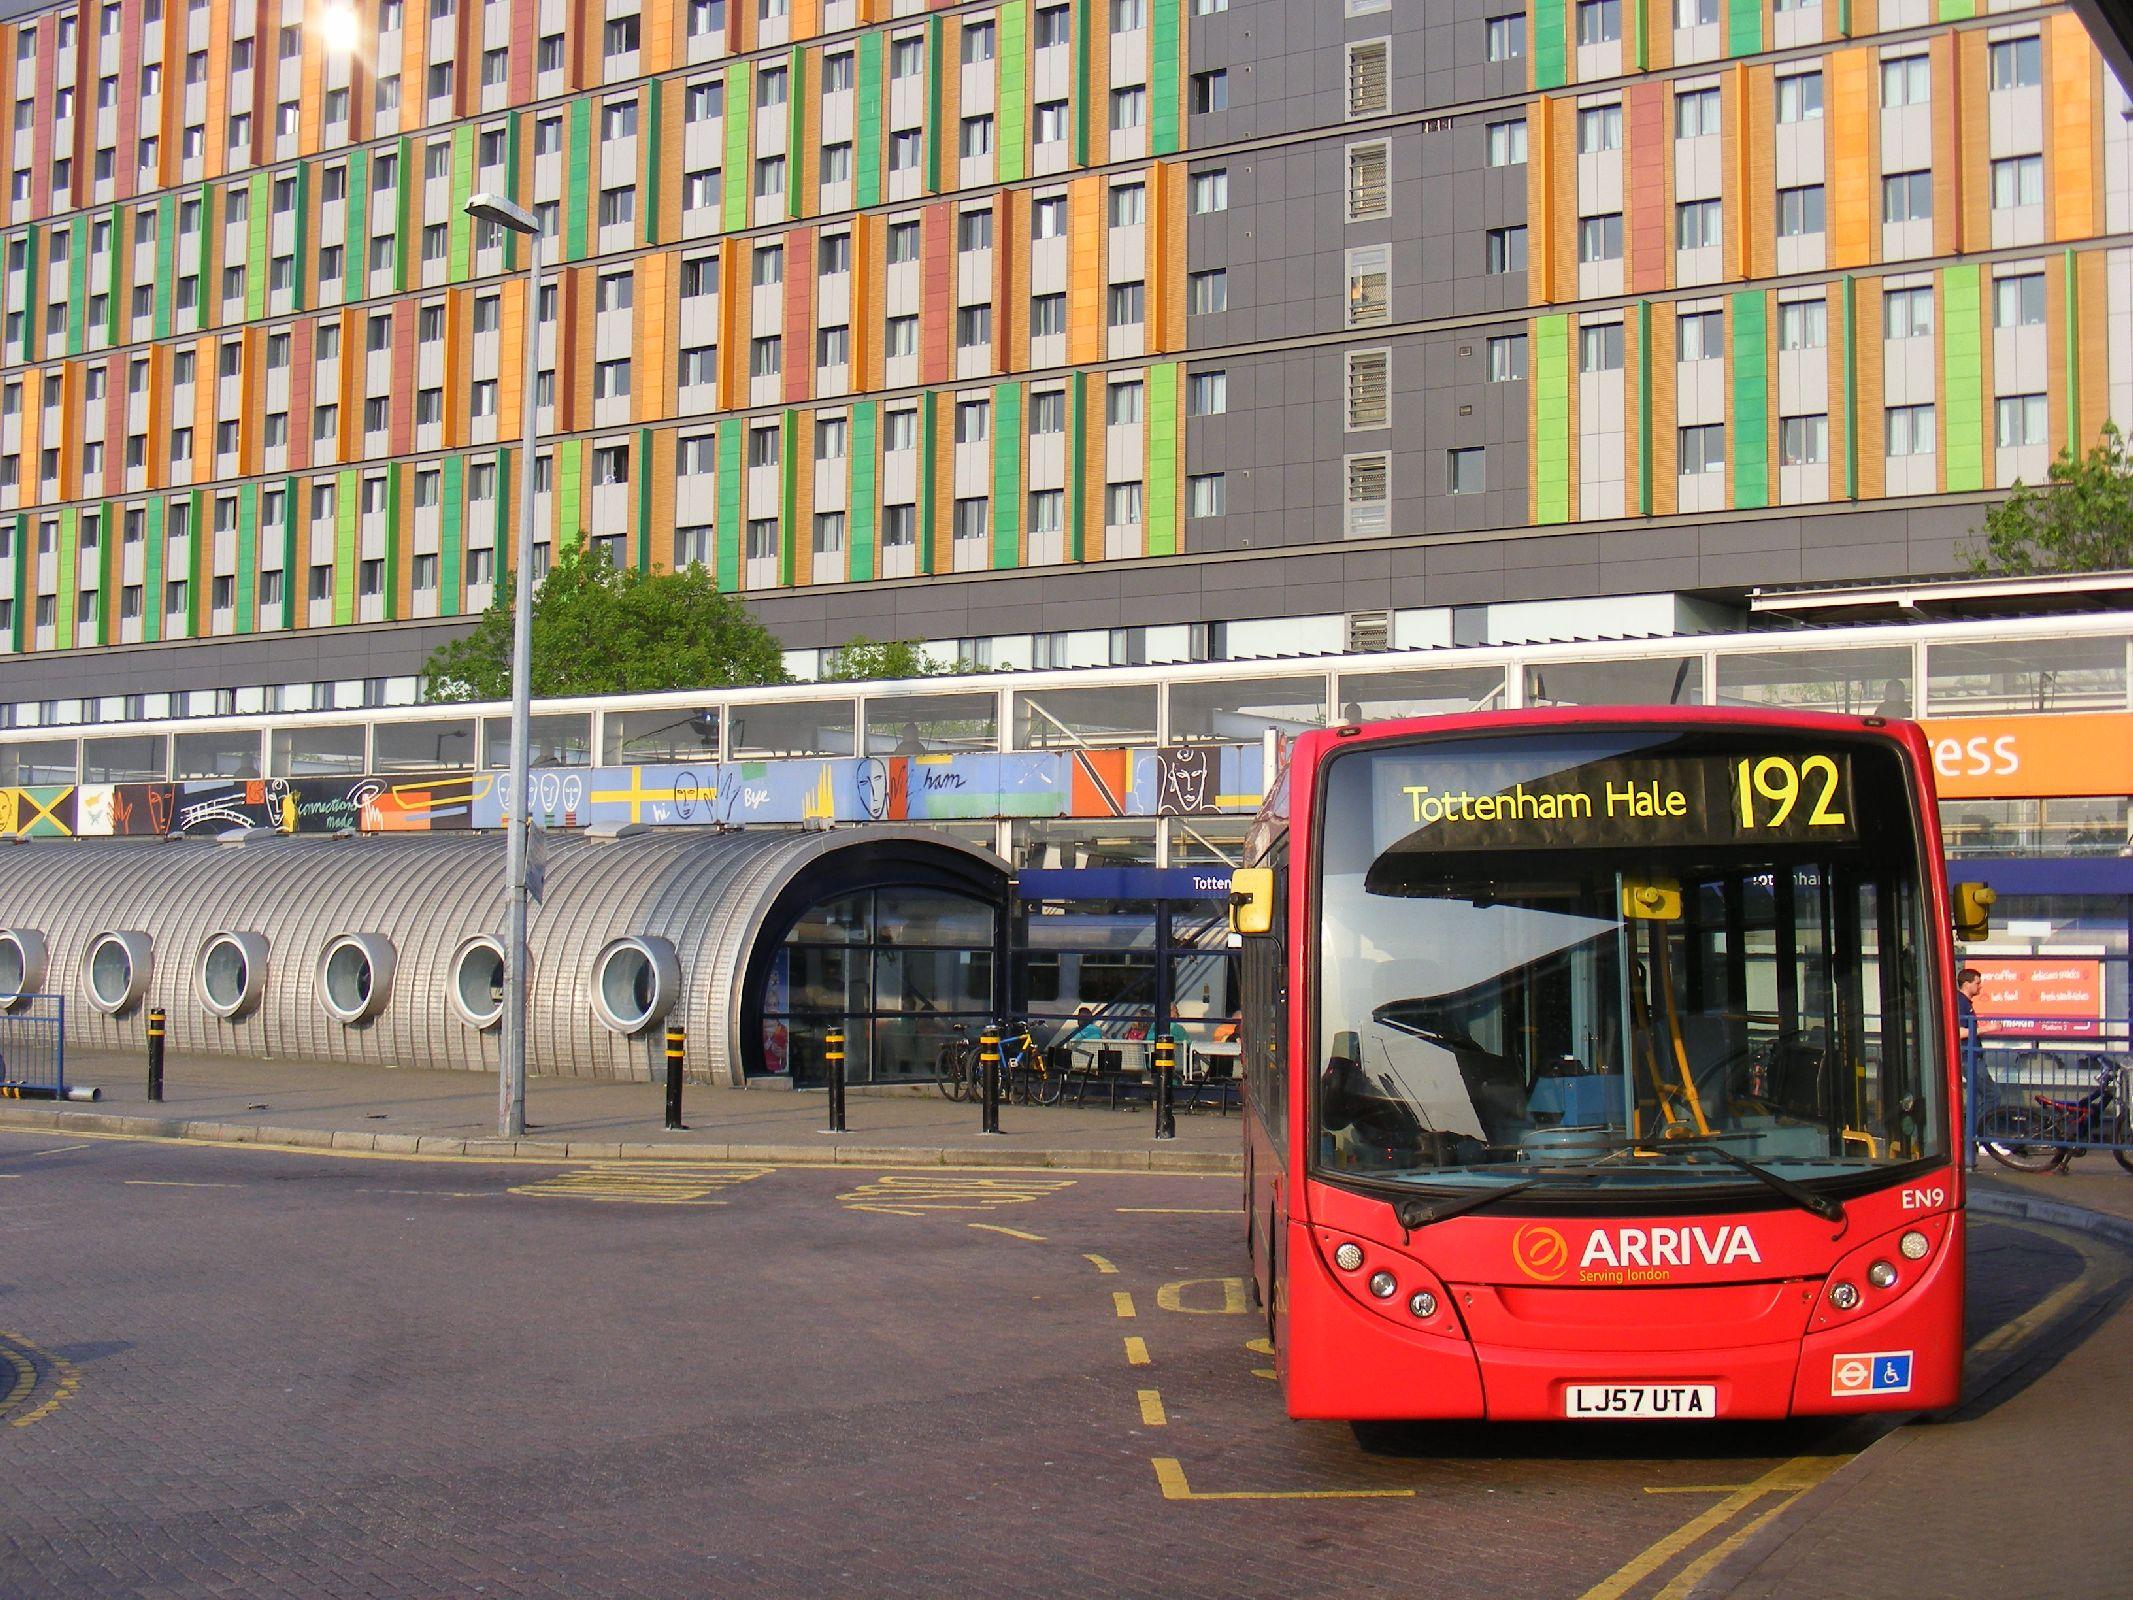 Tottenham Hale Bus Station Lost Property